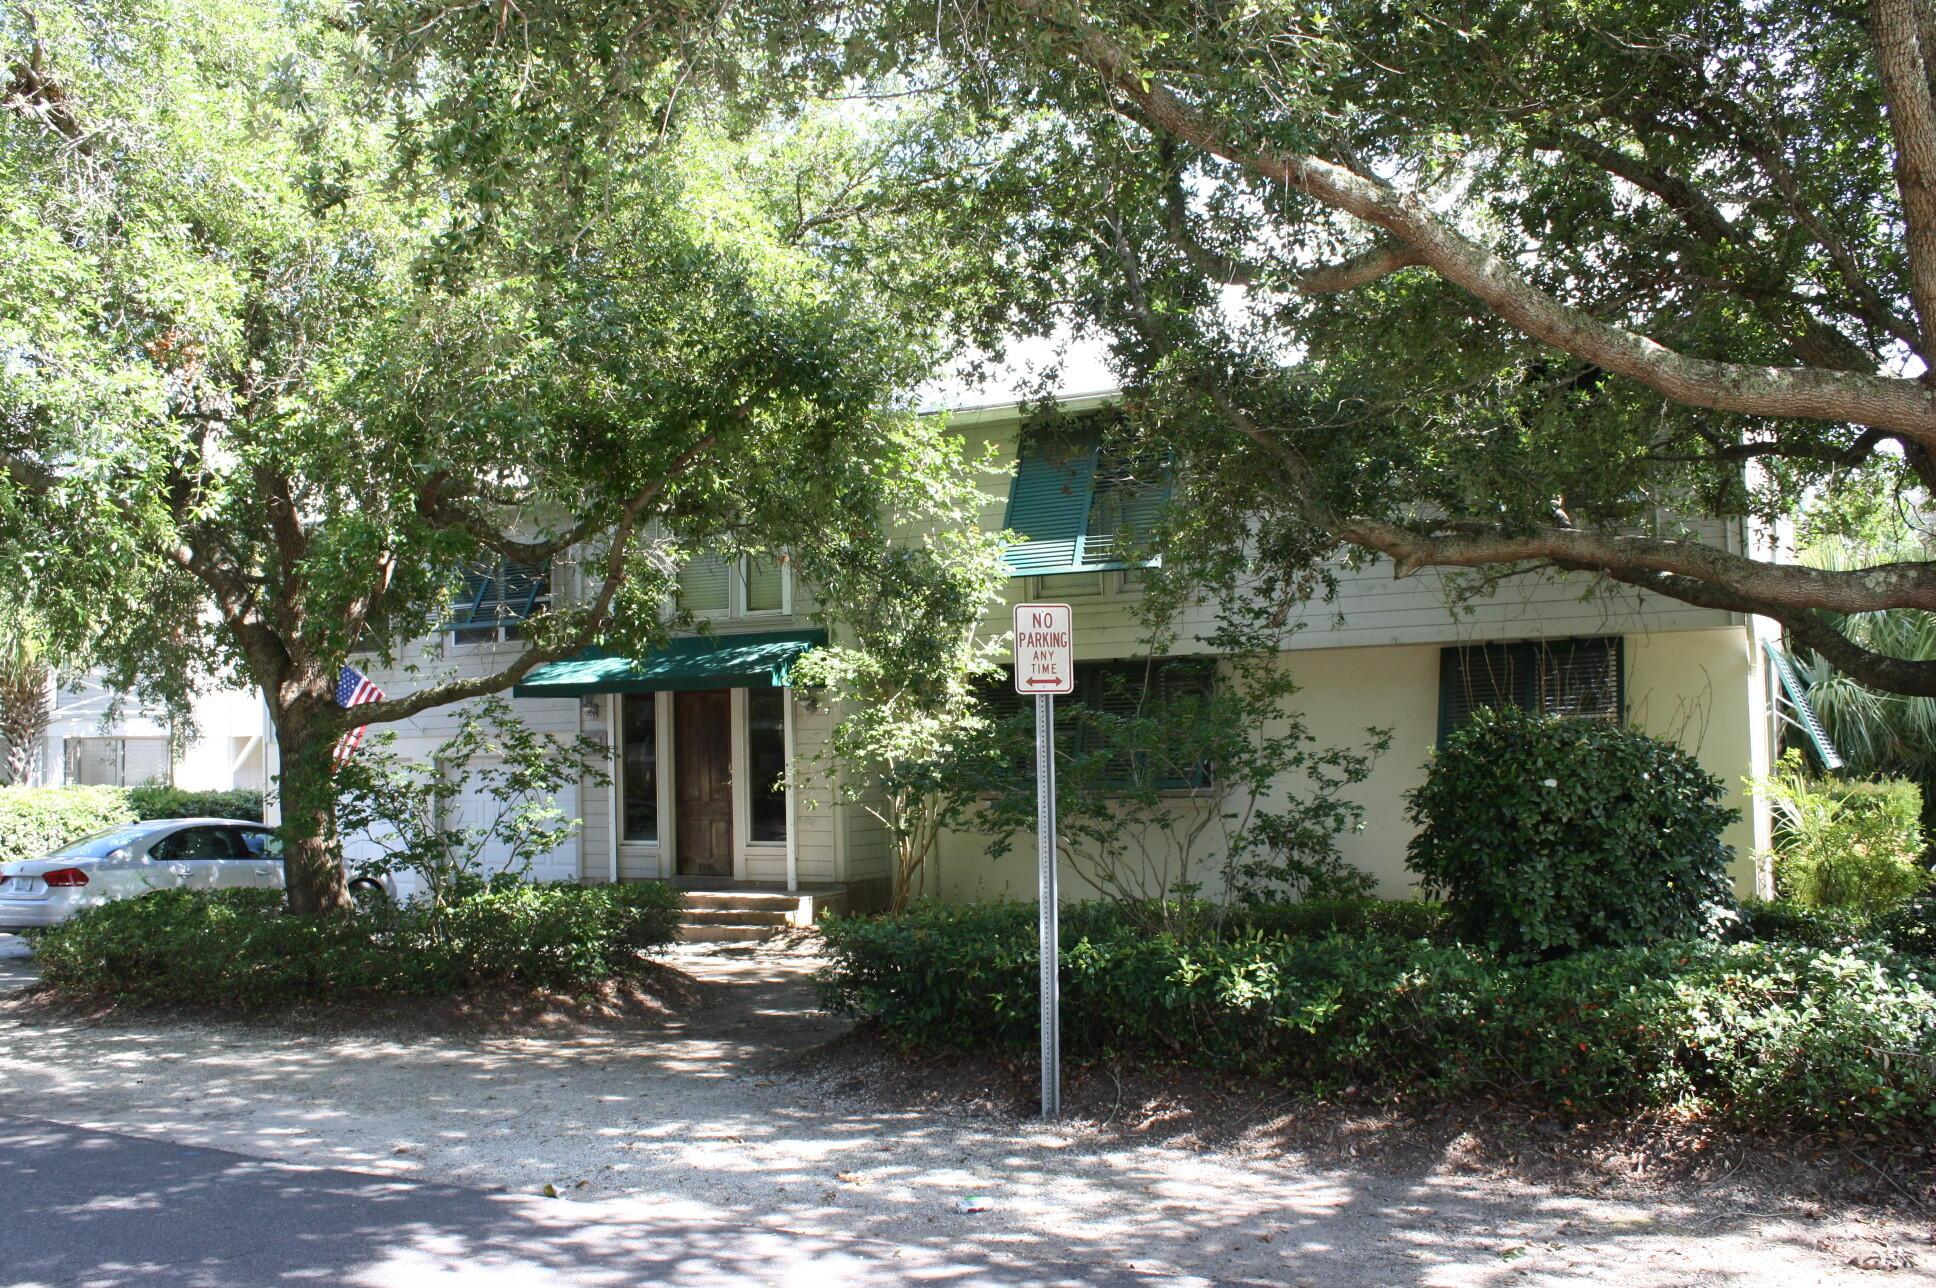 Sullivans Island Homes For Sale - 1601 Poe, Sullivans Island, SC - 31